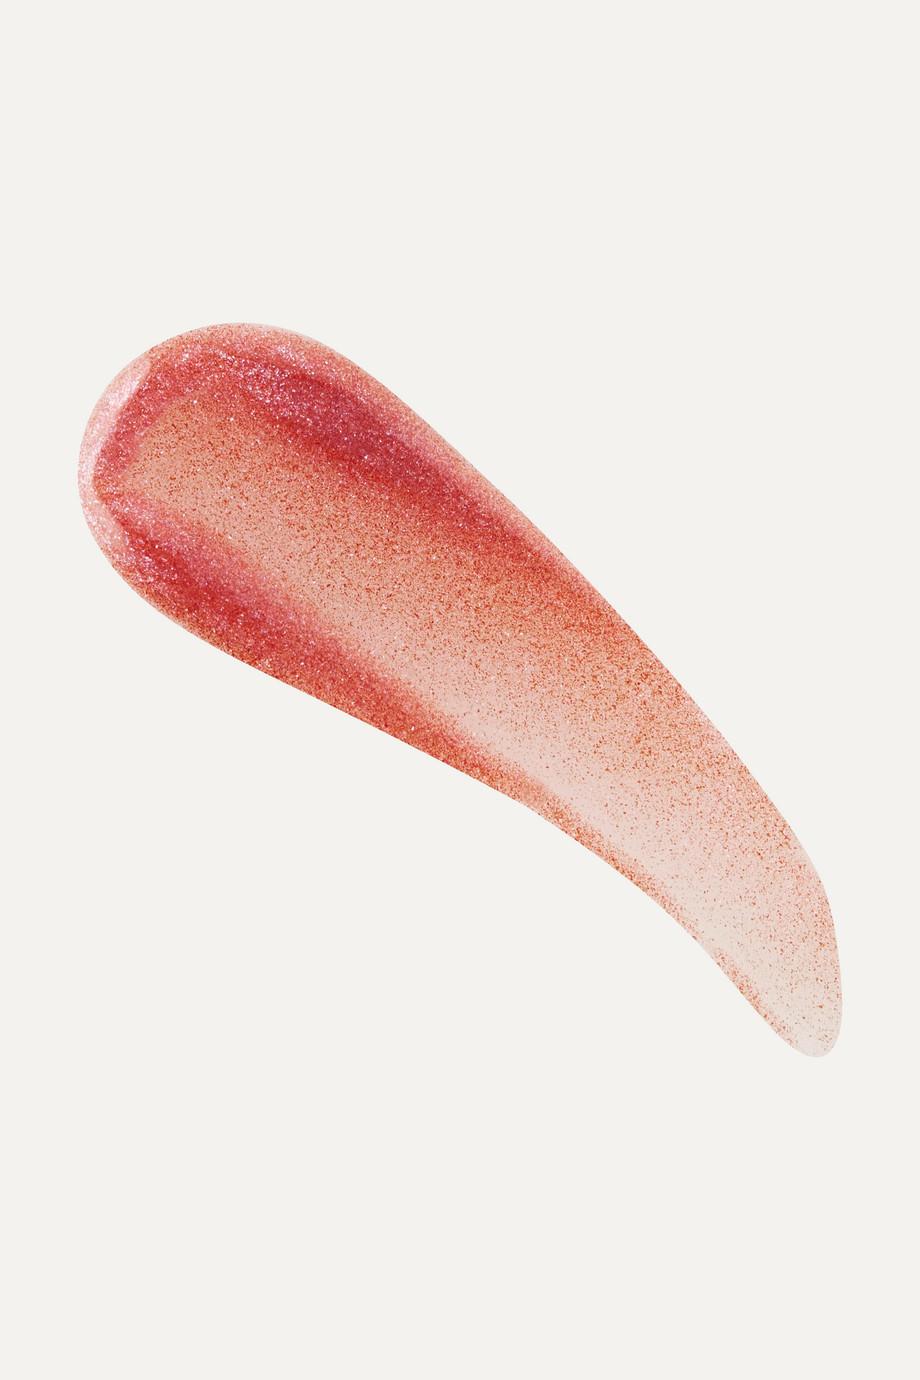 Christian Louboutin Beauty Loubilaque Lip Gloss - Doracandy